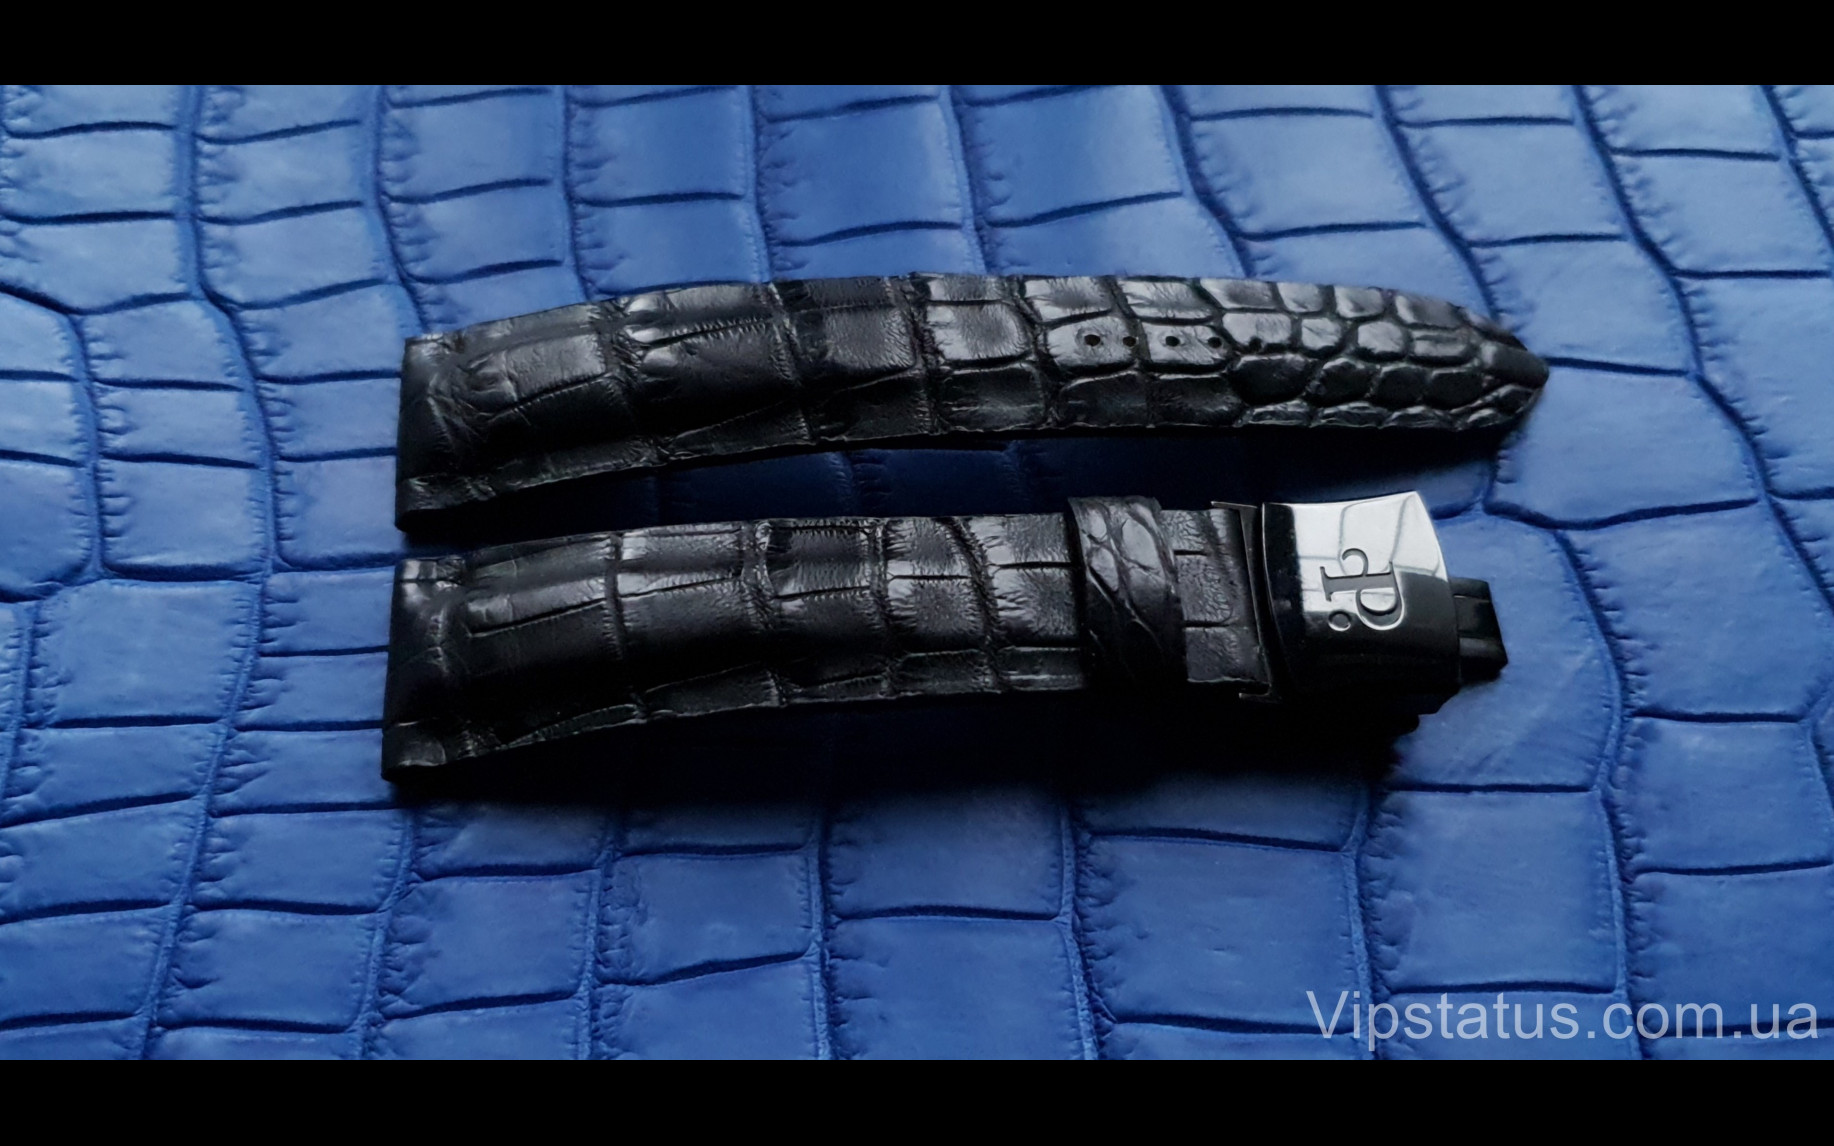 Elite Элитный ремешок для часов Perrelet кожа крокодила Elite Crocodile Strap for Perrelet watches image 2